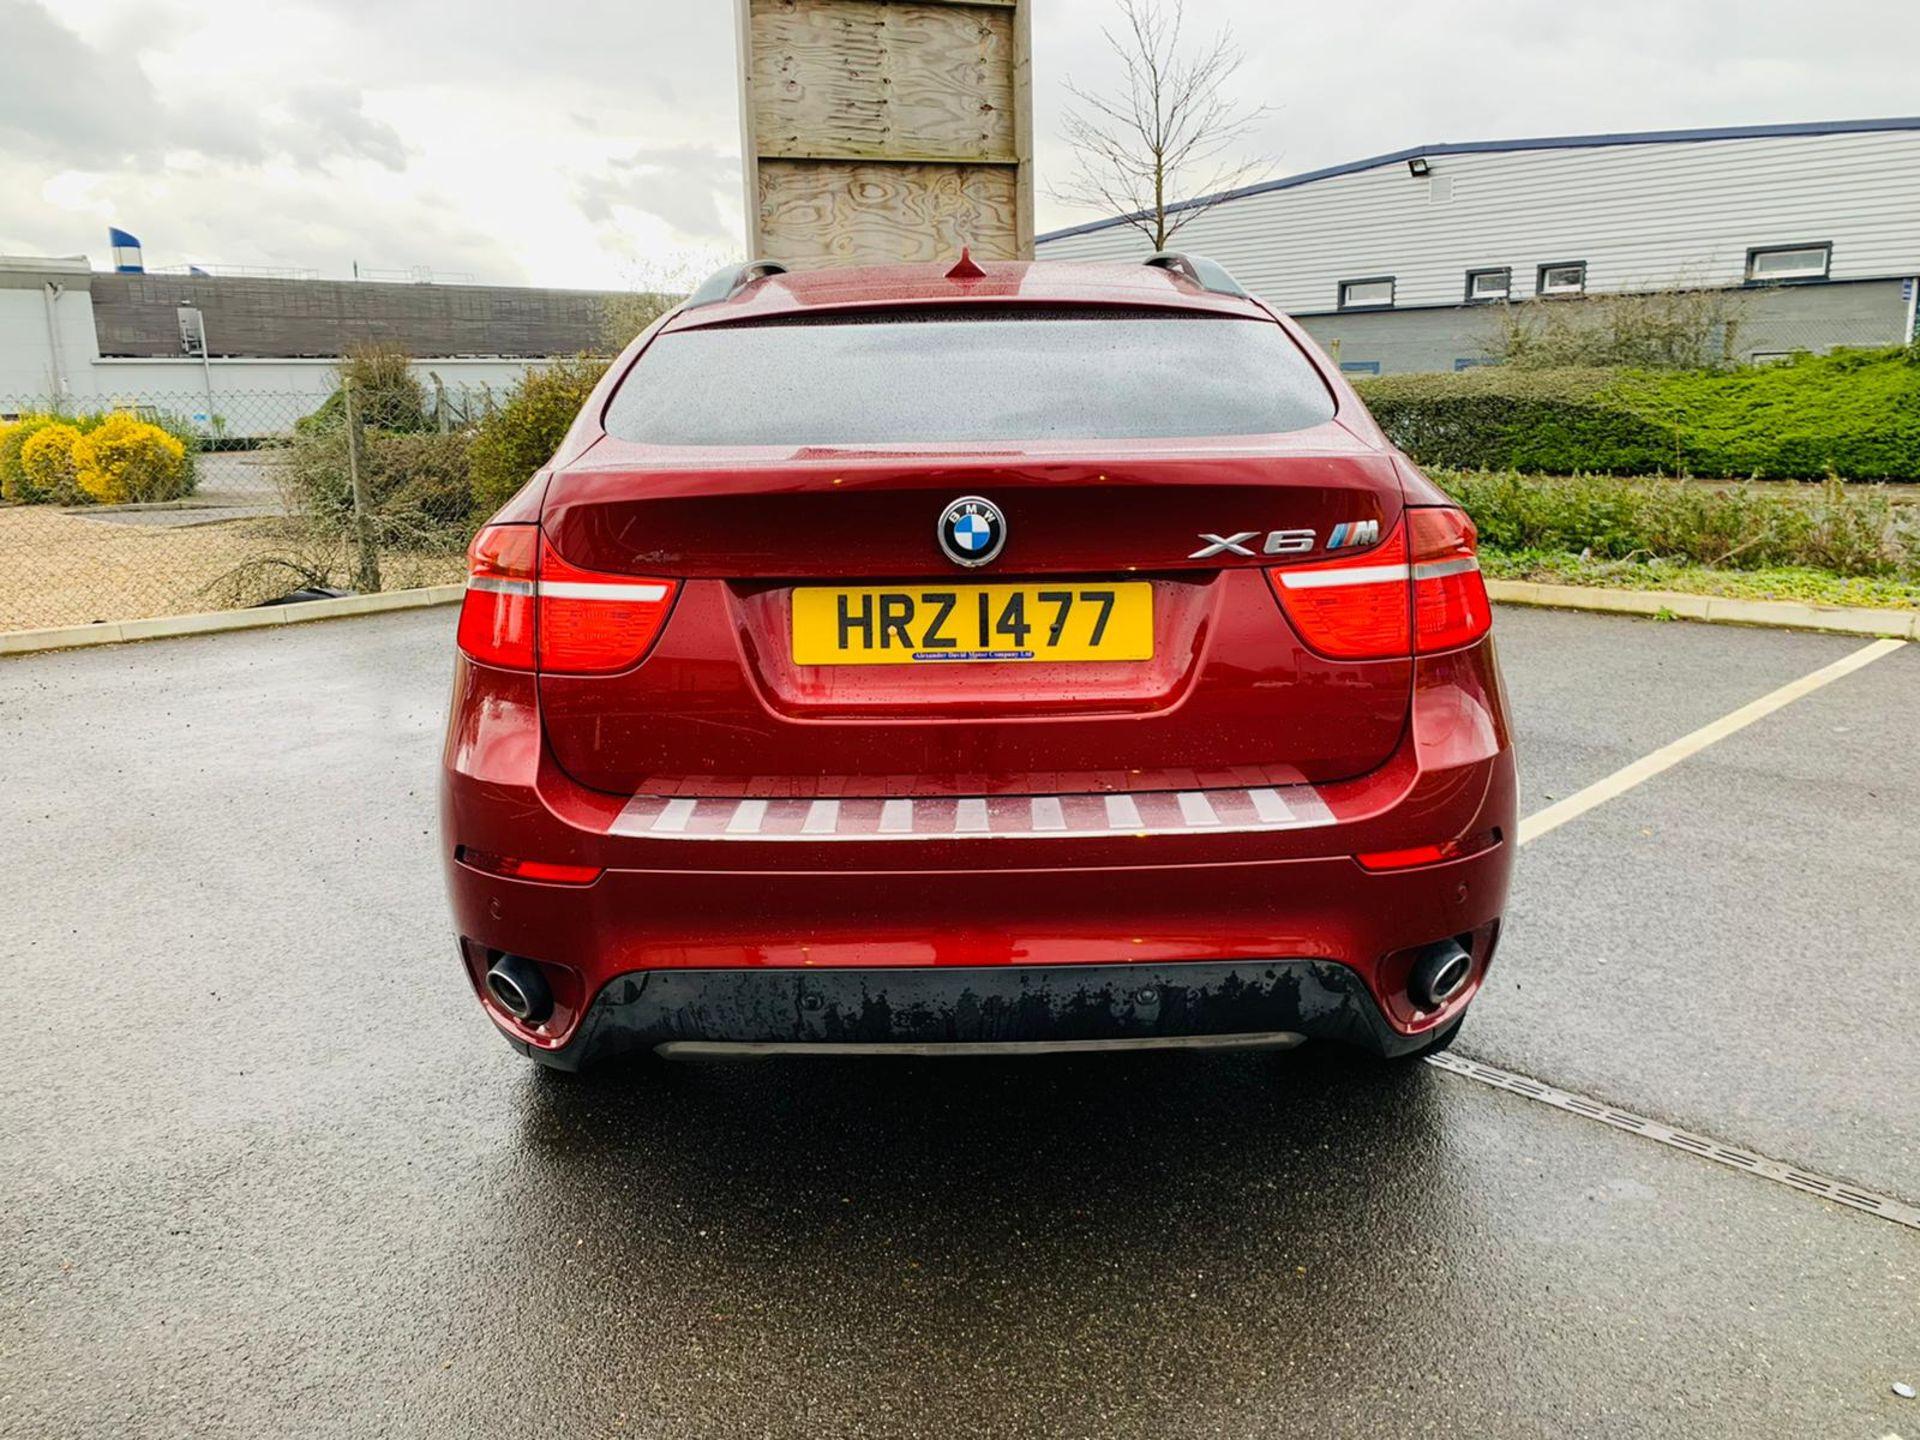 Reseve Met - BMW X6 xDrive 3.0d Auto - 2014 Reg - Leather Interior -Parking Sensors - Reversing Cam - Image 4 of 30